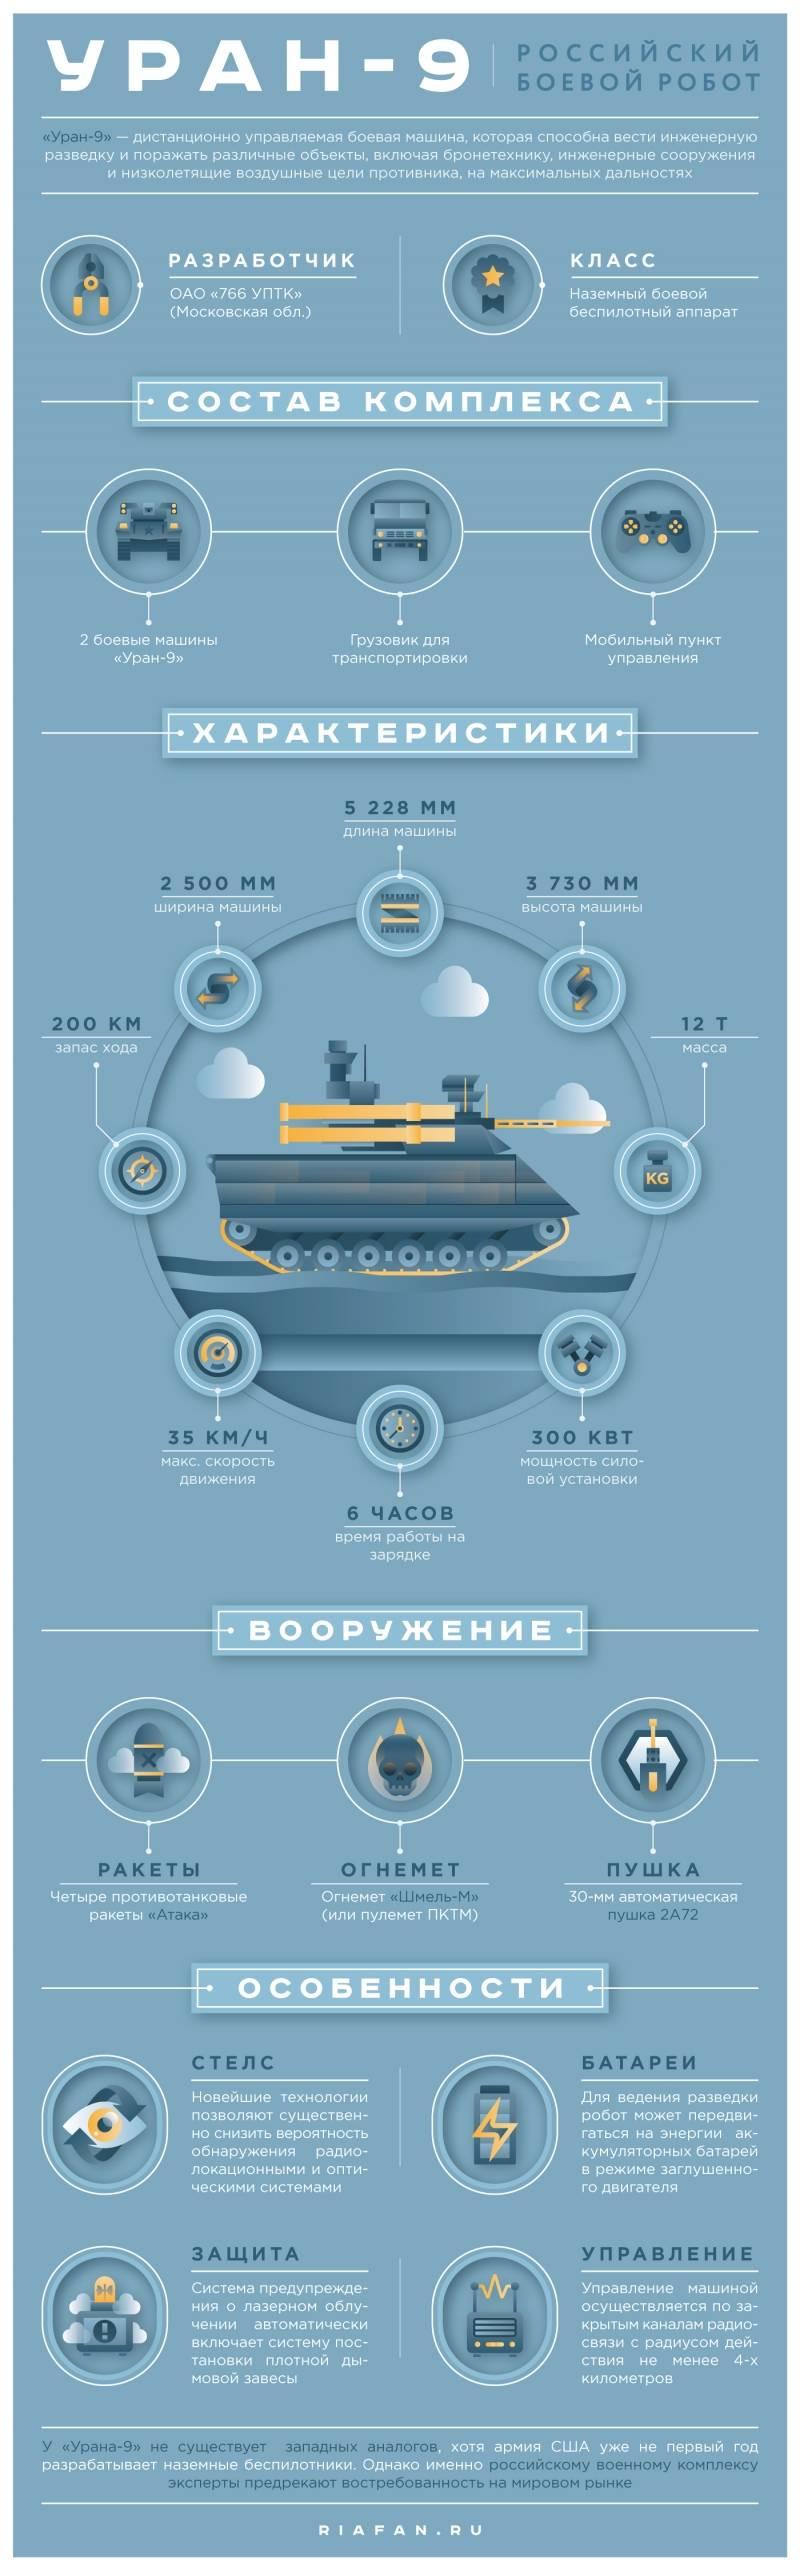 "Combate complexo robótico ""Uran-9"". Infográficos"